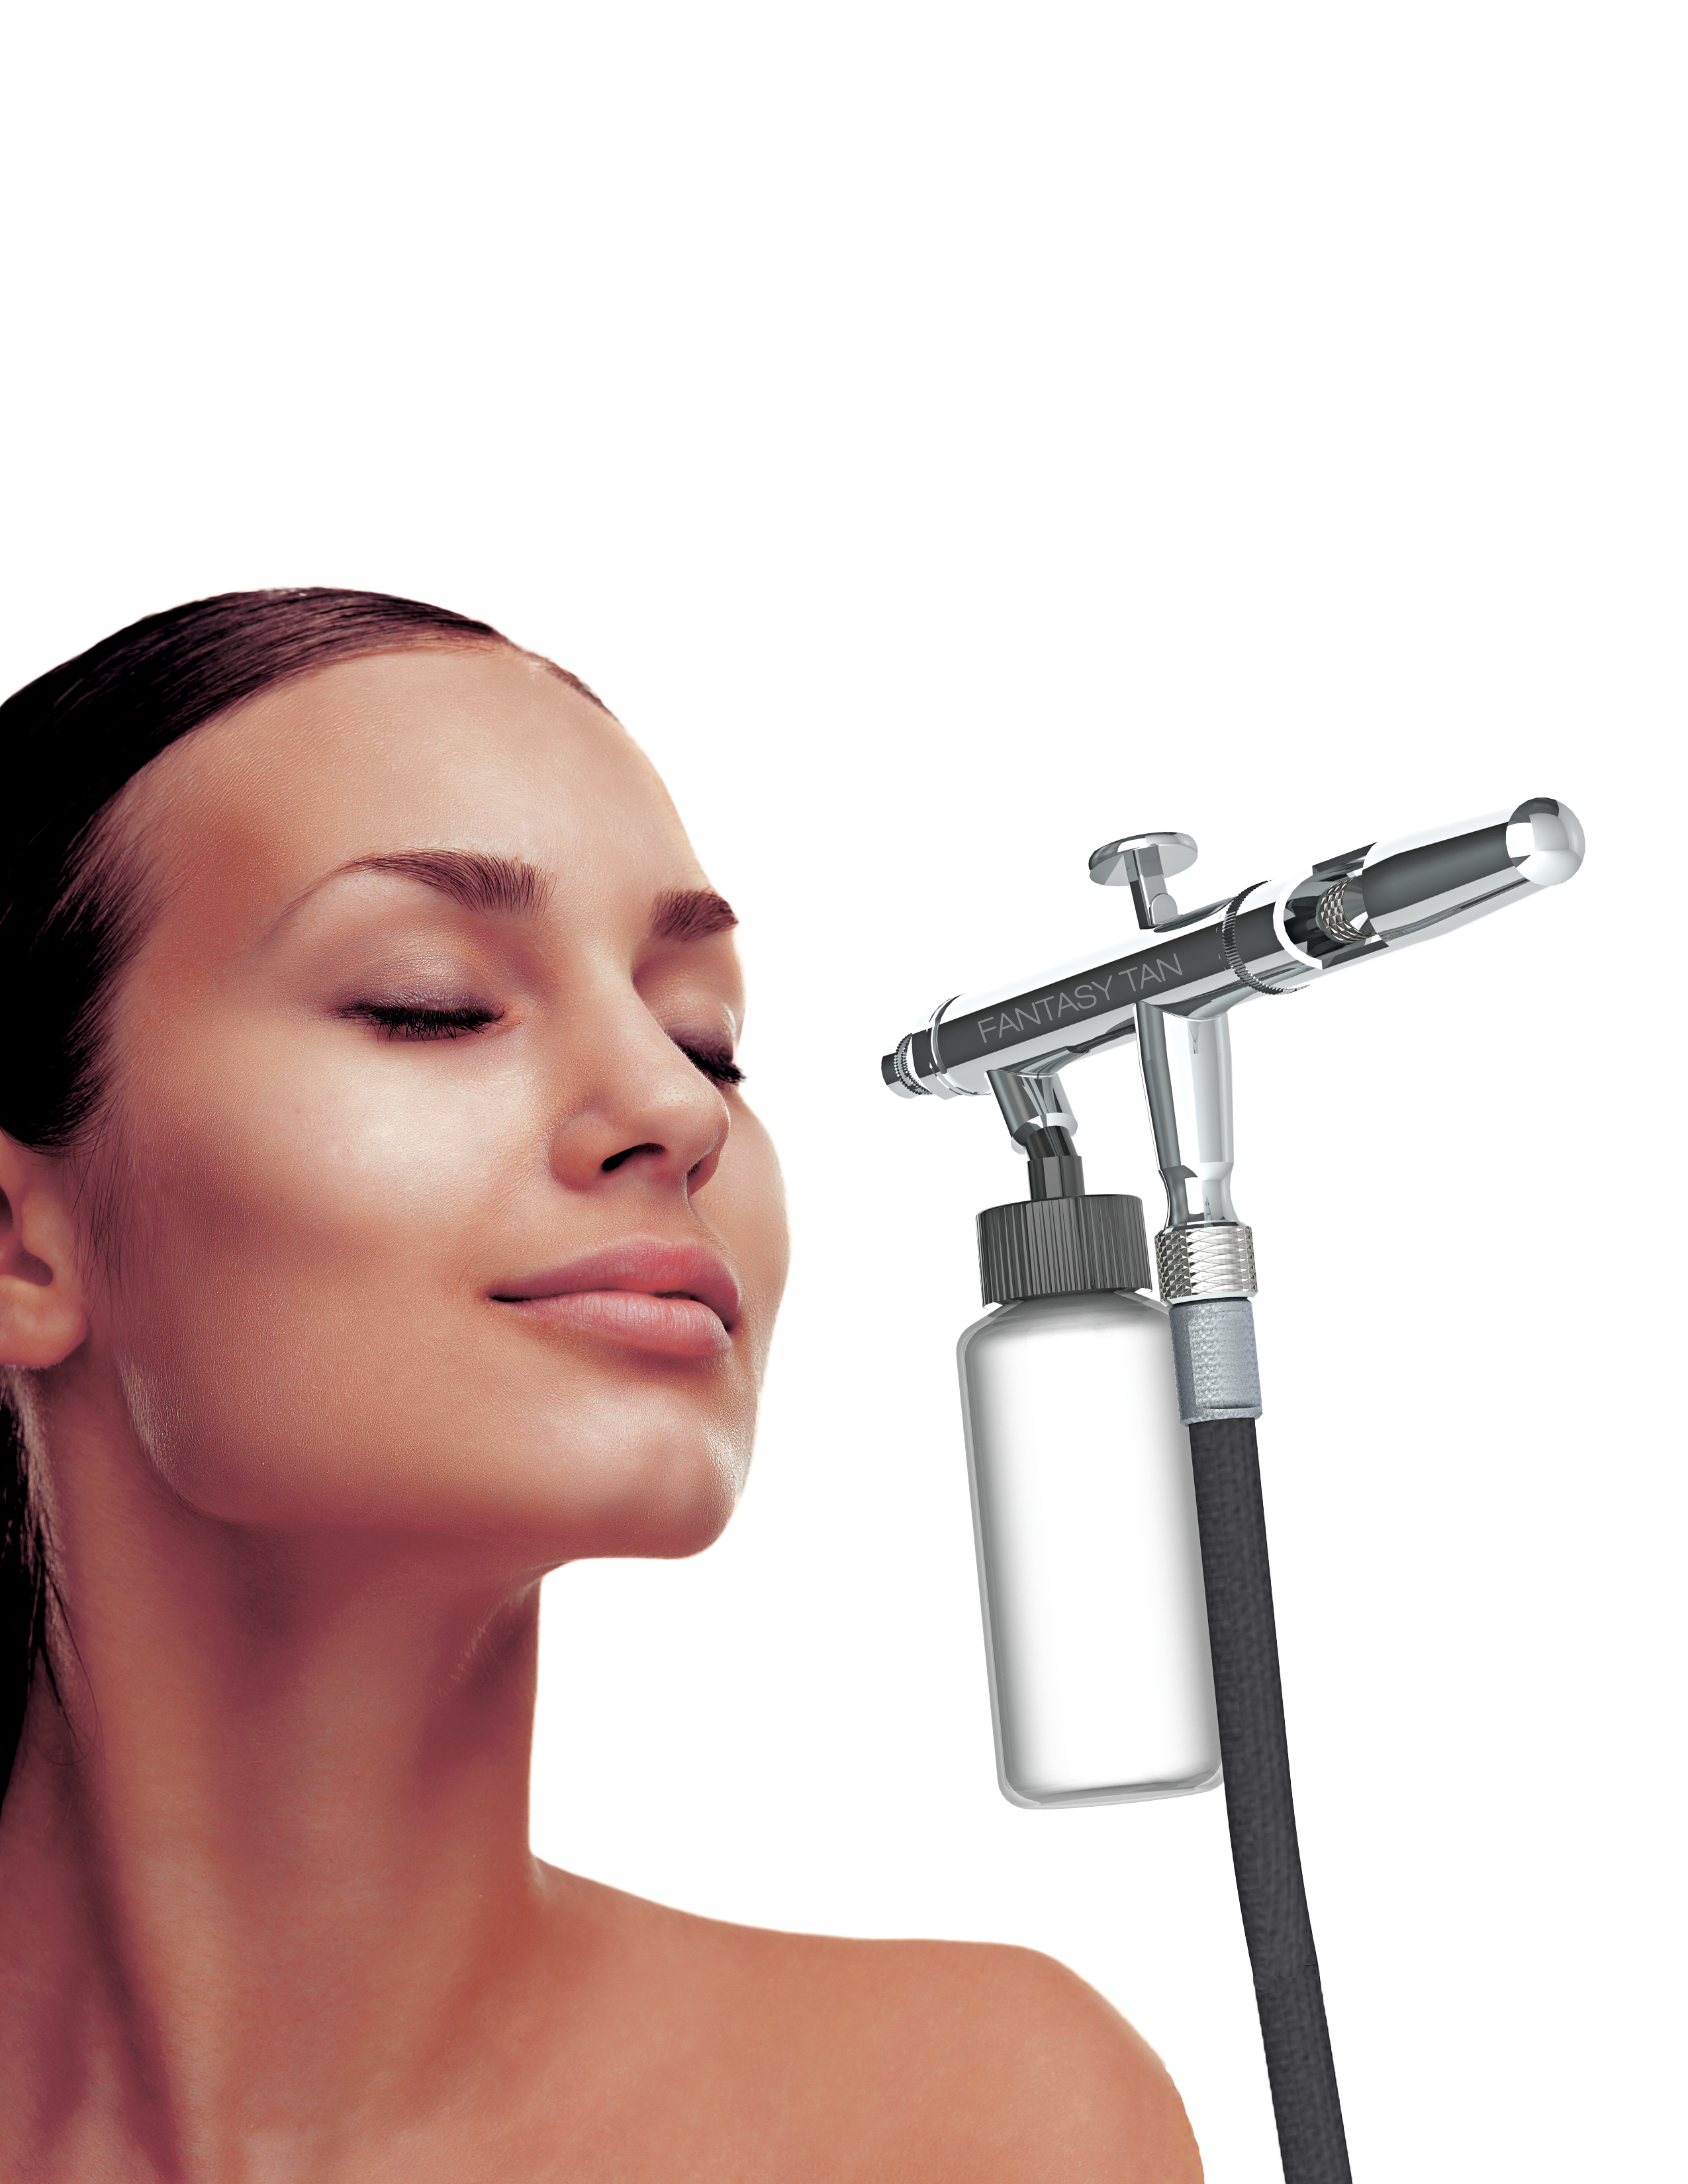 $55 Full Body Spray Tan